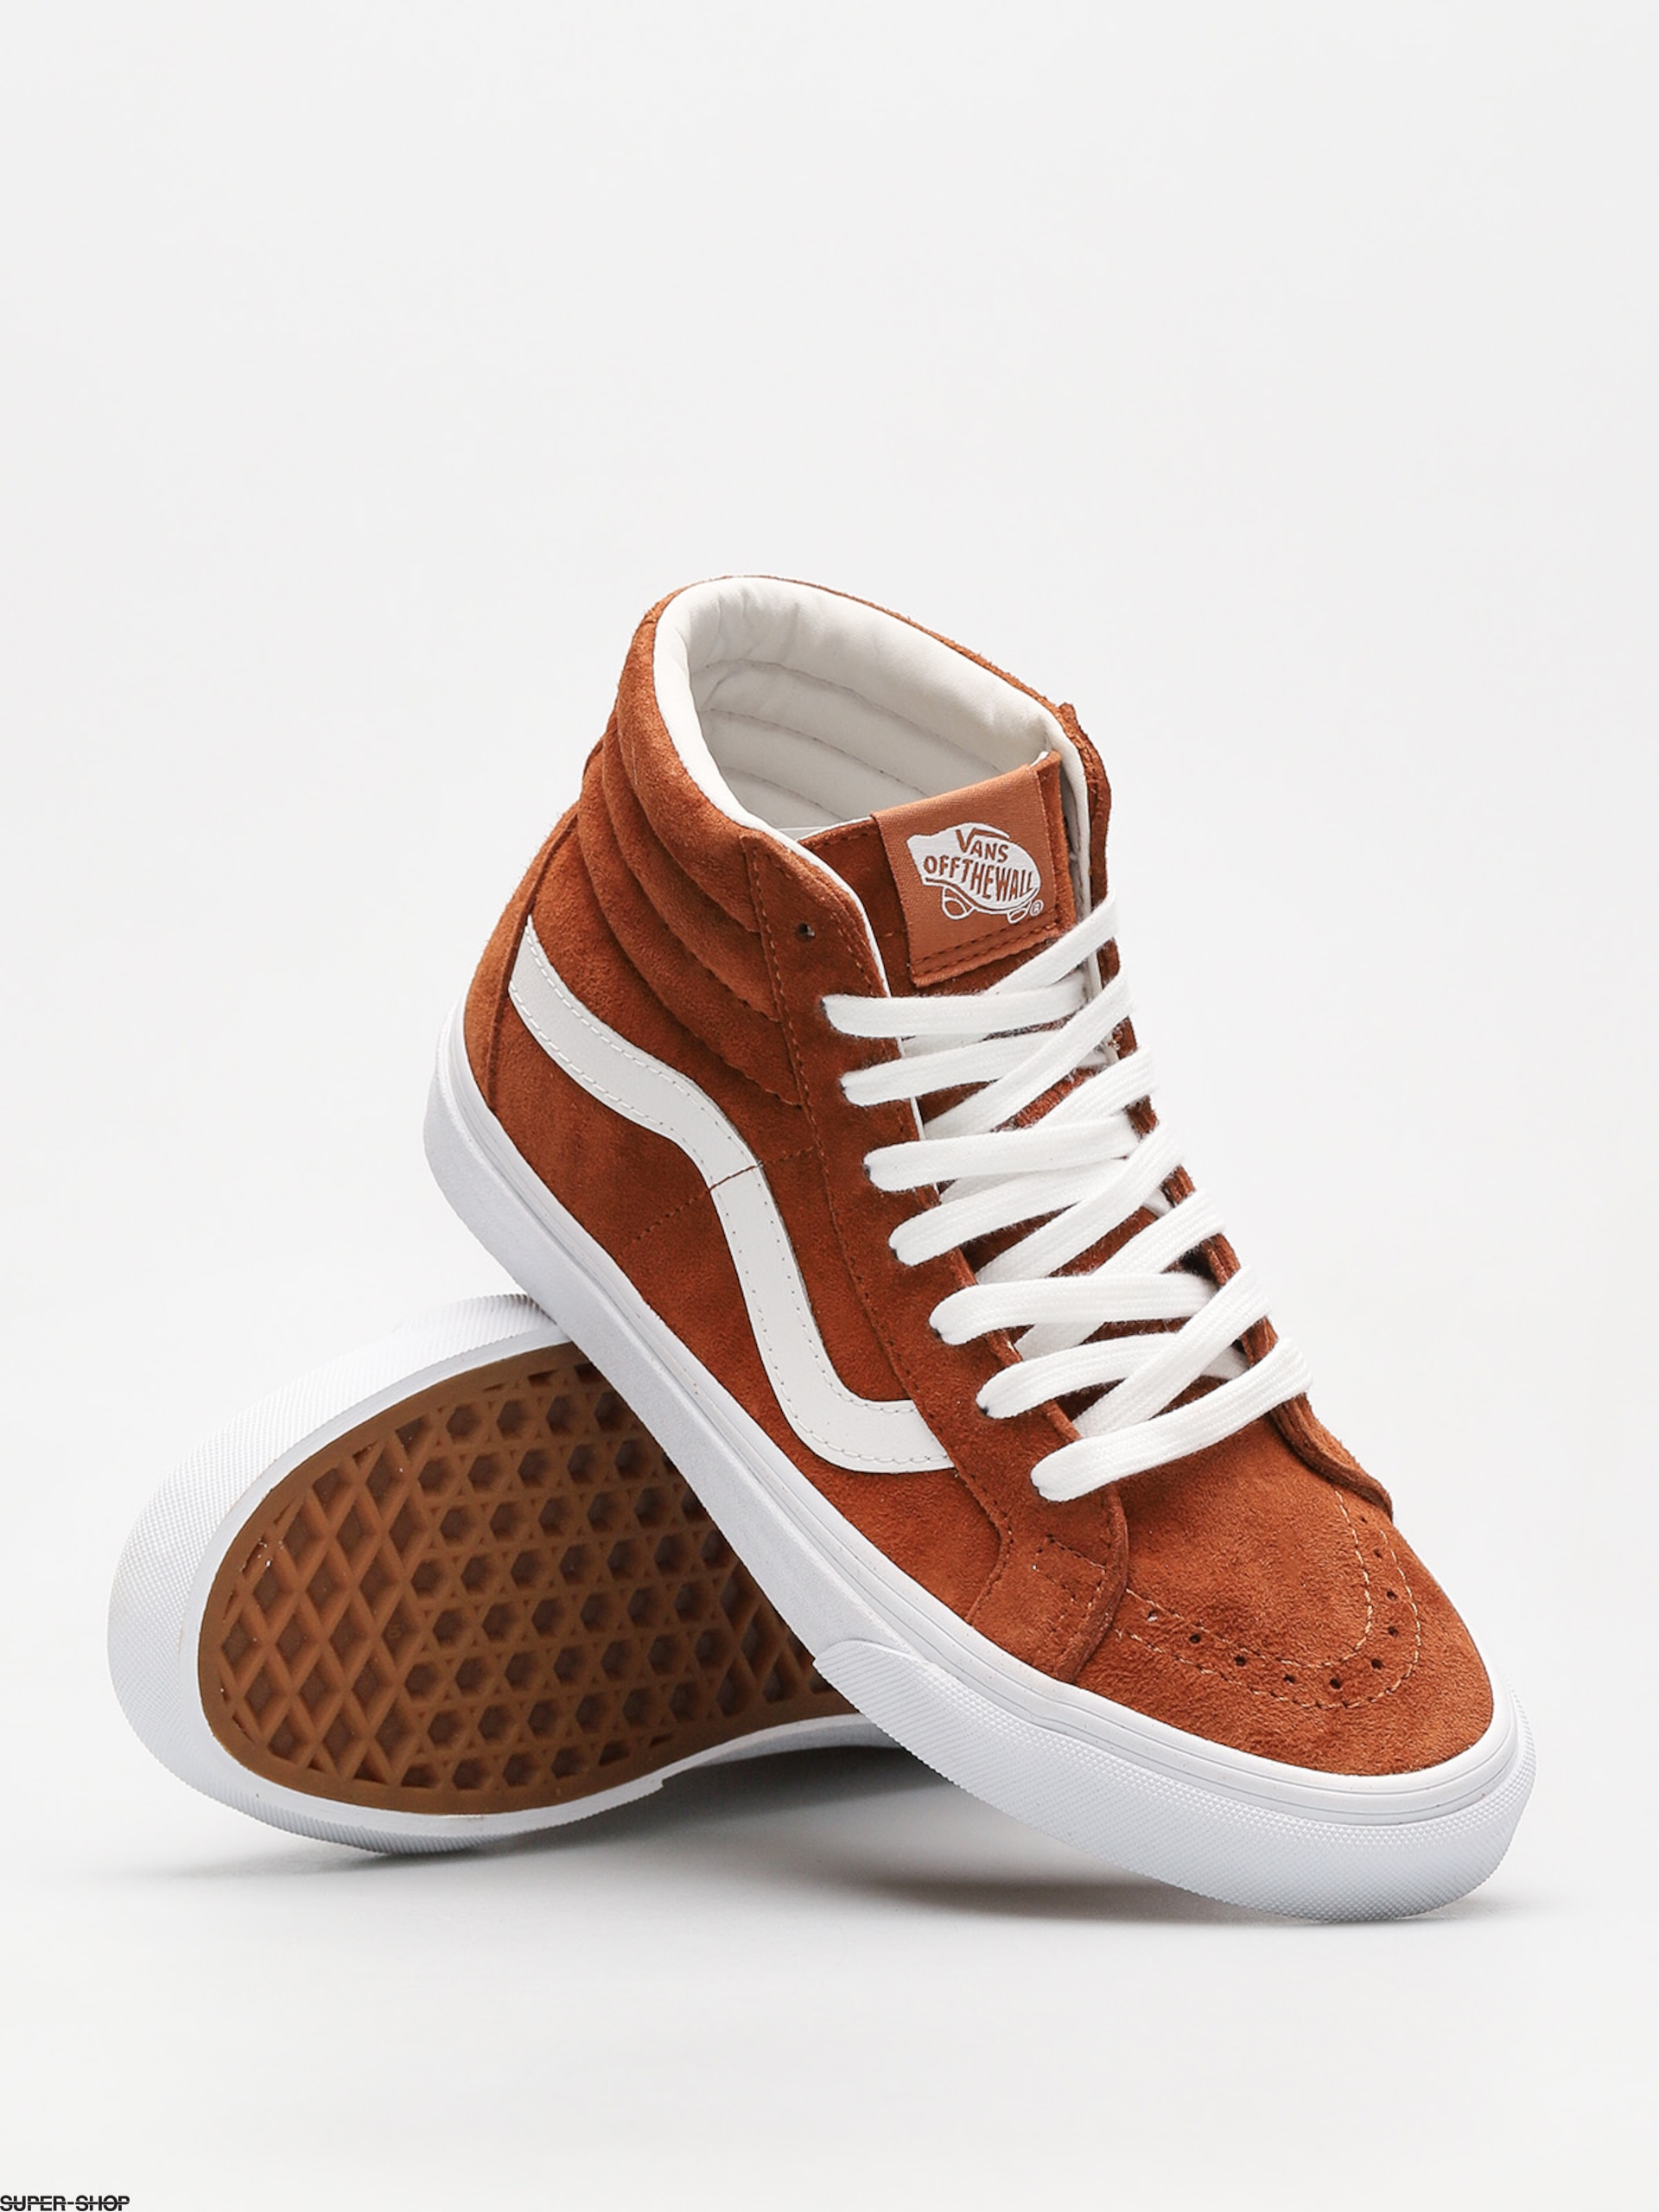 Vans Shoes Sk8 Hi Reissue (leather brown true white) 441e551a0ab2